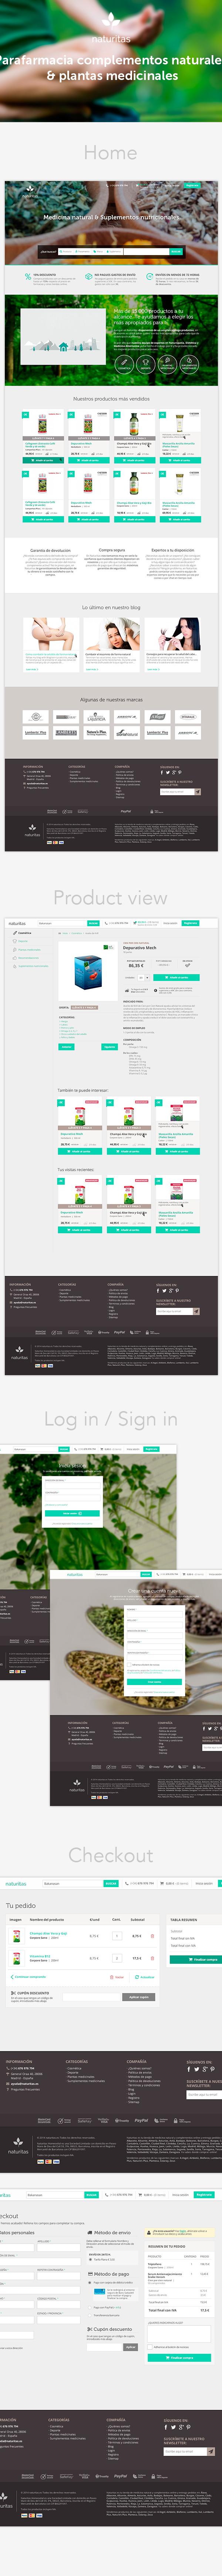 Webdesign ux UI